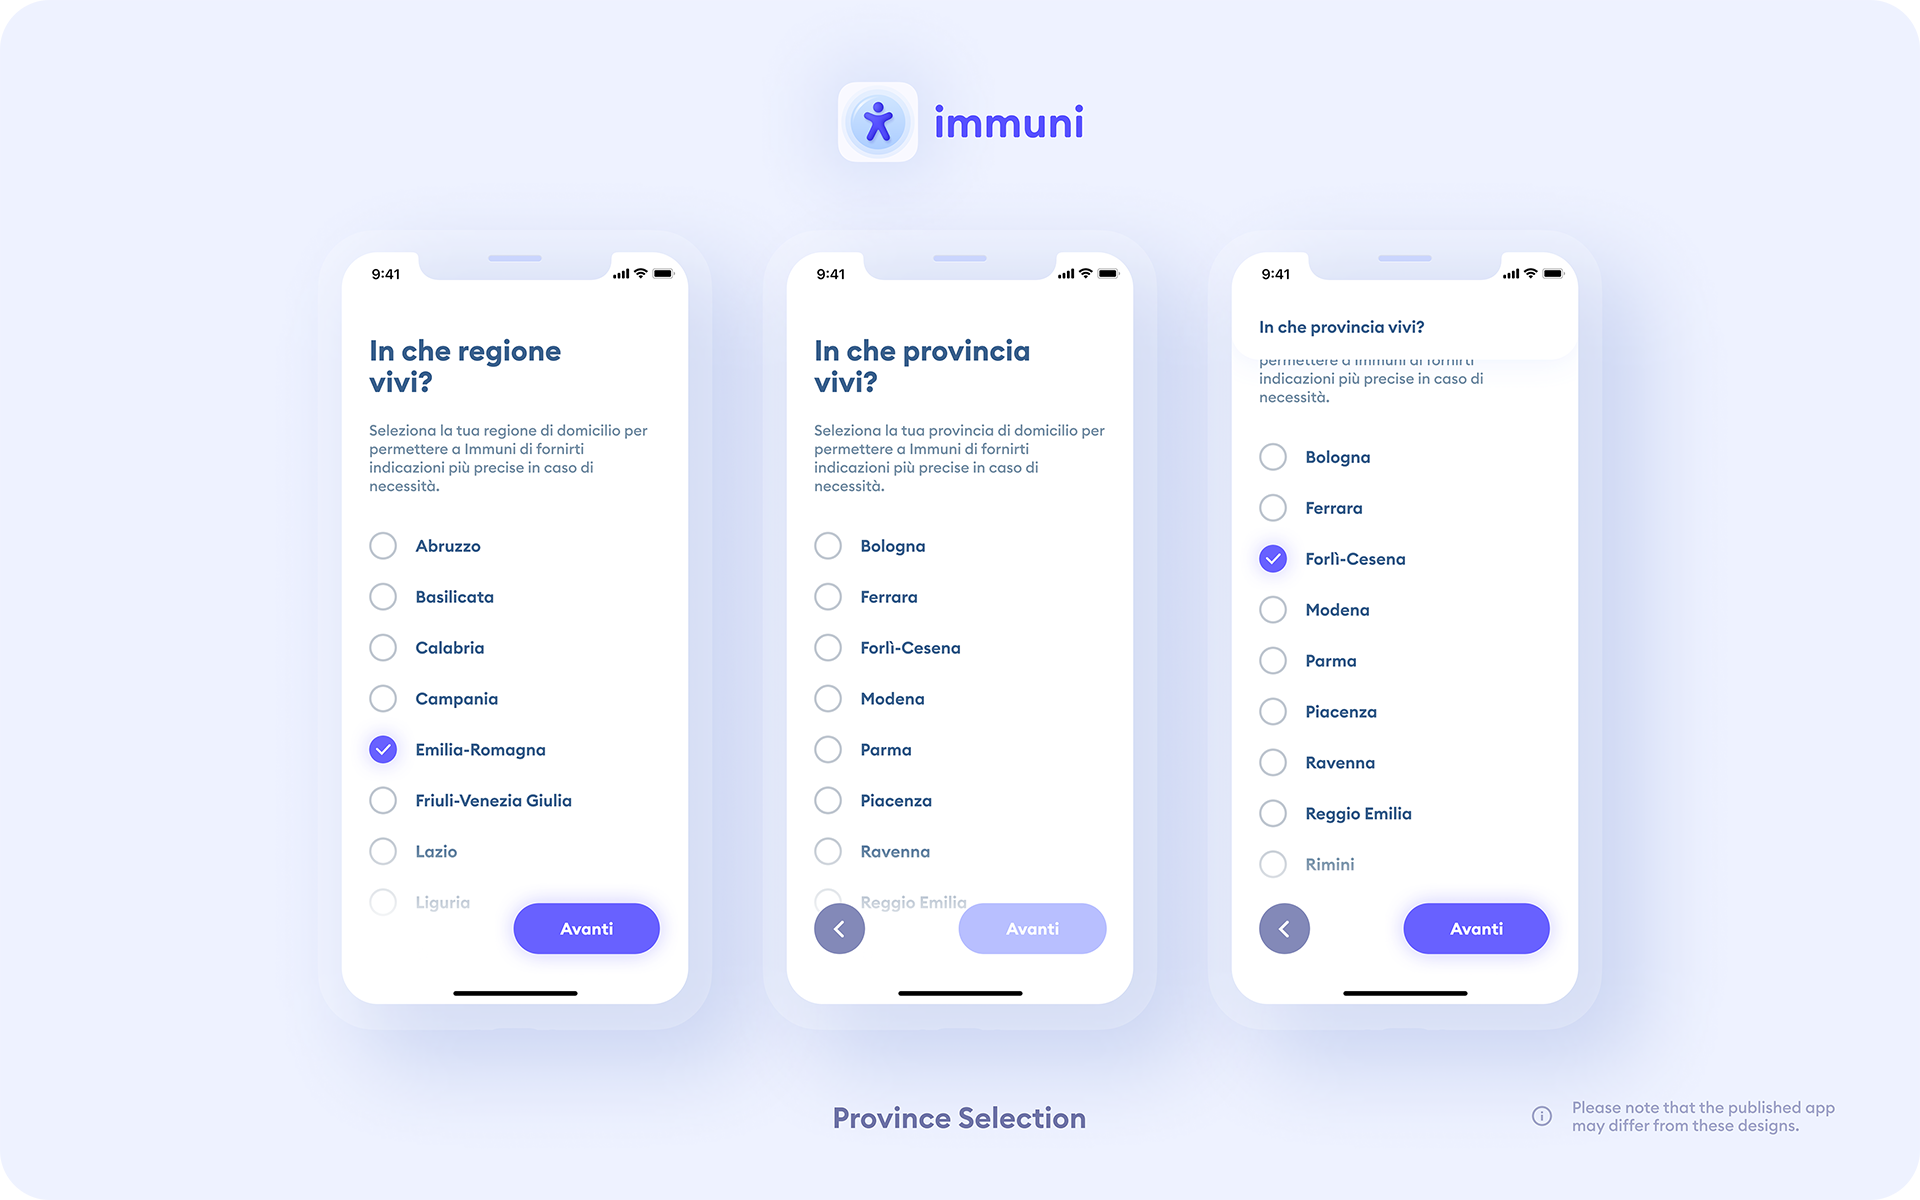 Immuni - ProvinceSelection